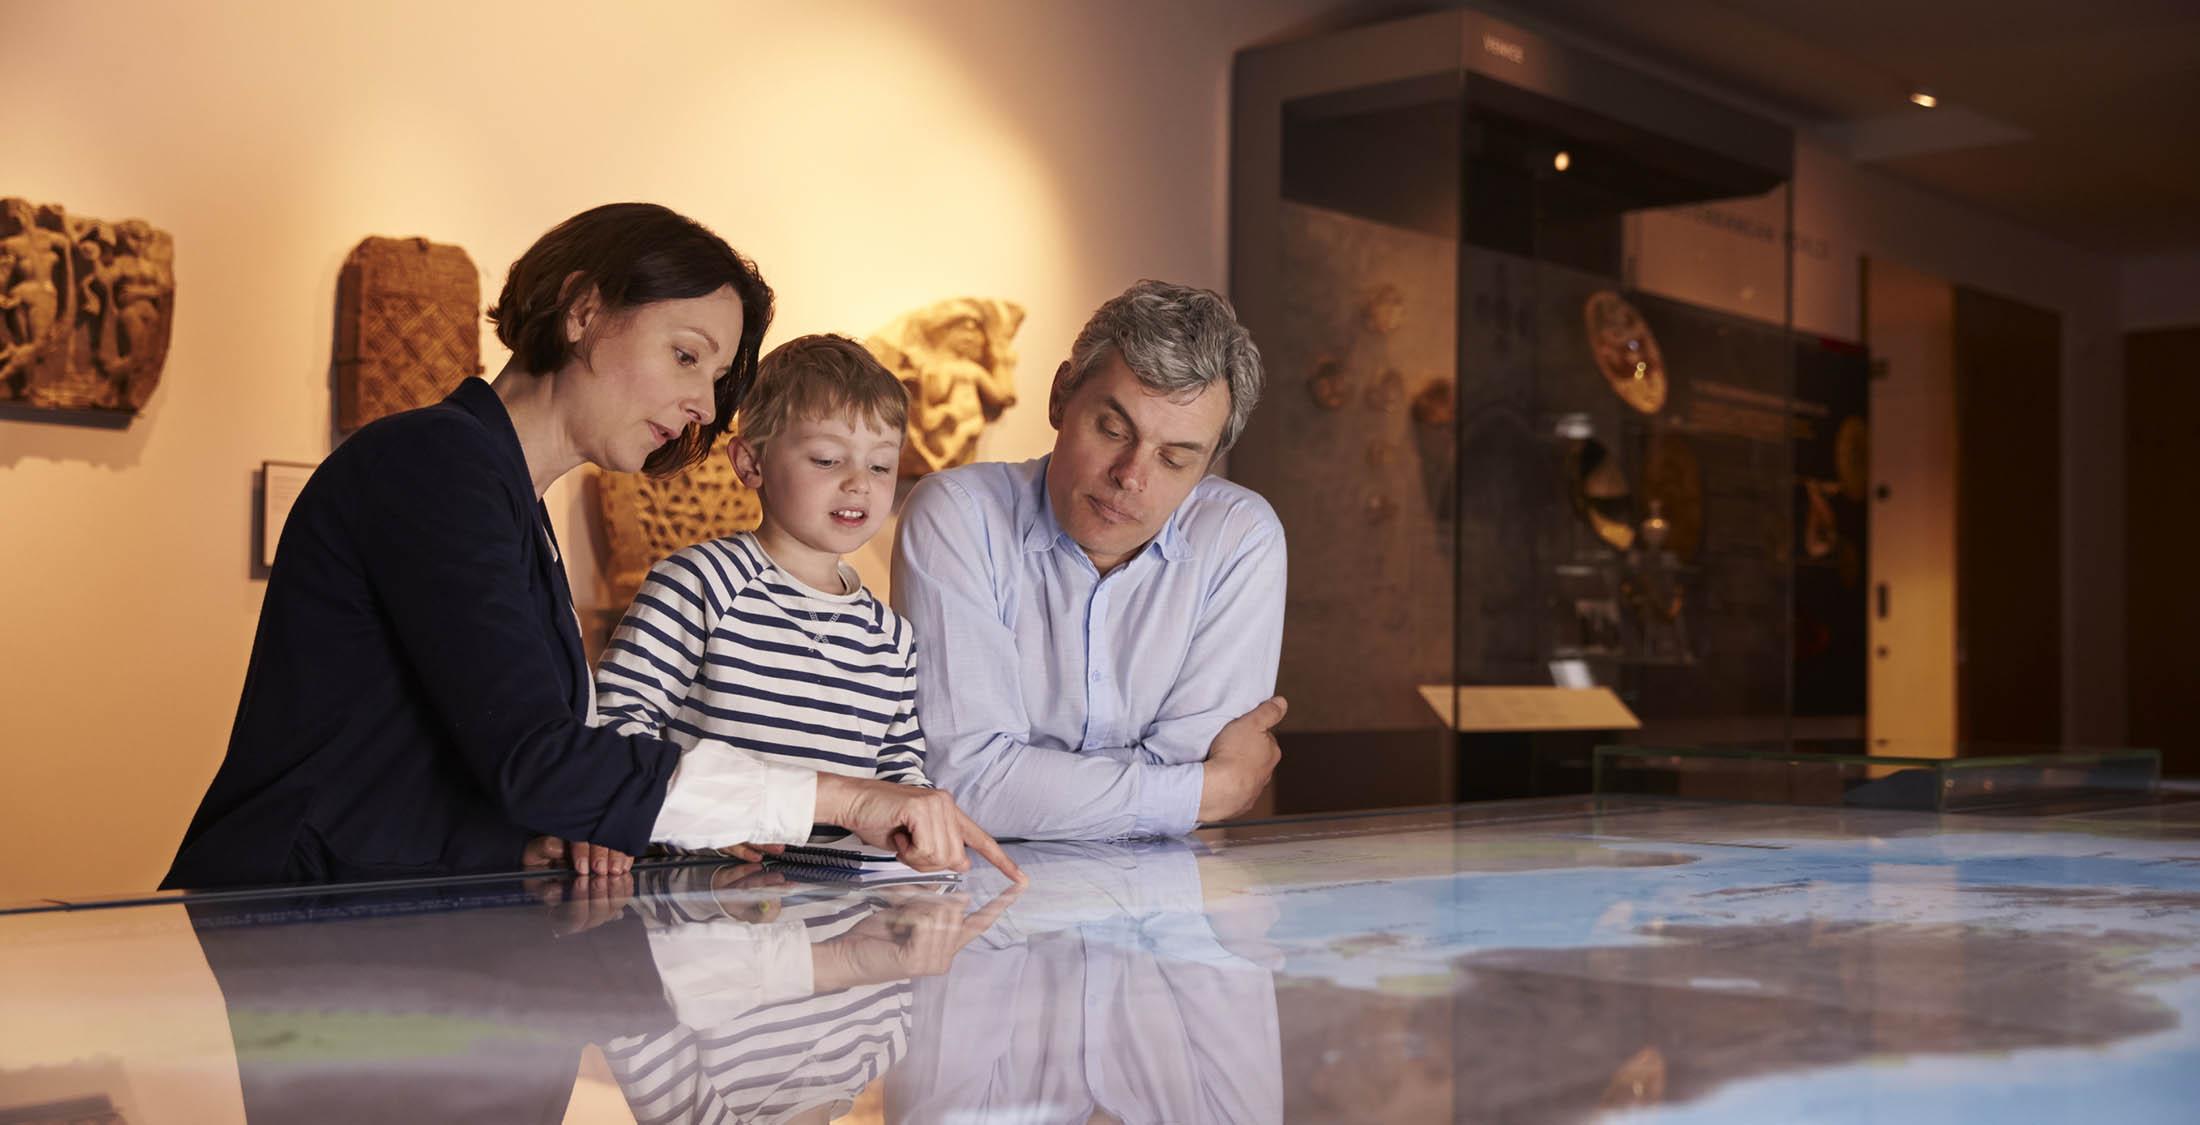 take advantage of free museum days